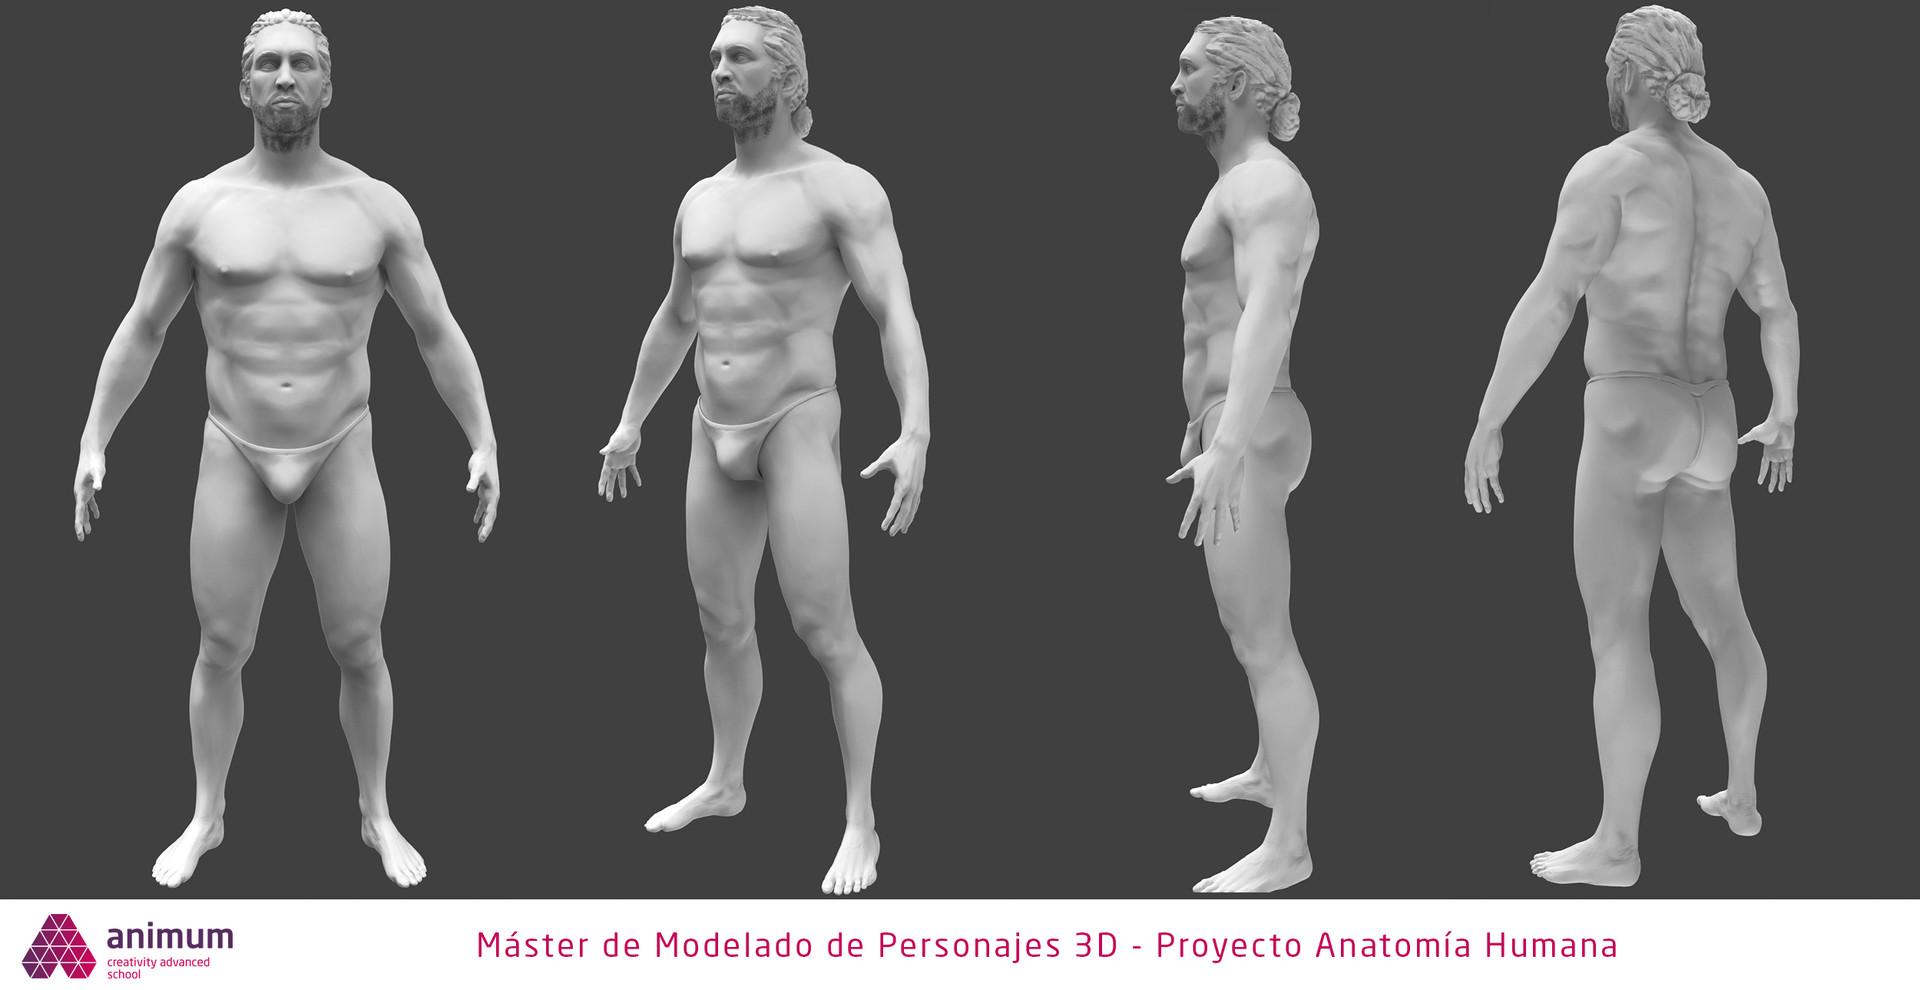 Edgar teba mateo plantilla modelado de personajes 3d anatomiahumana